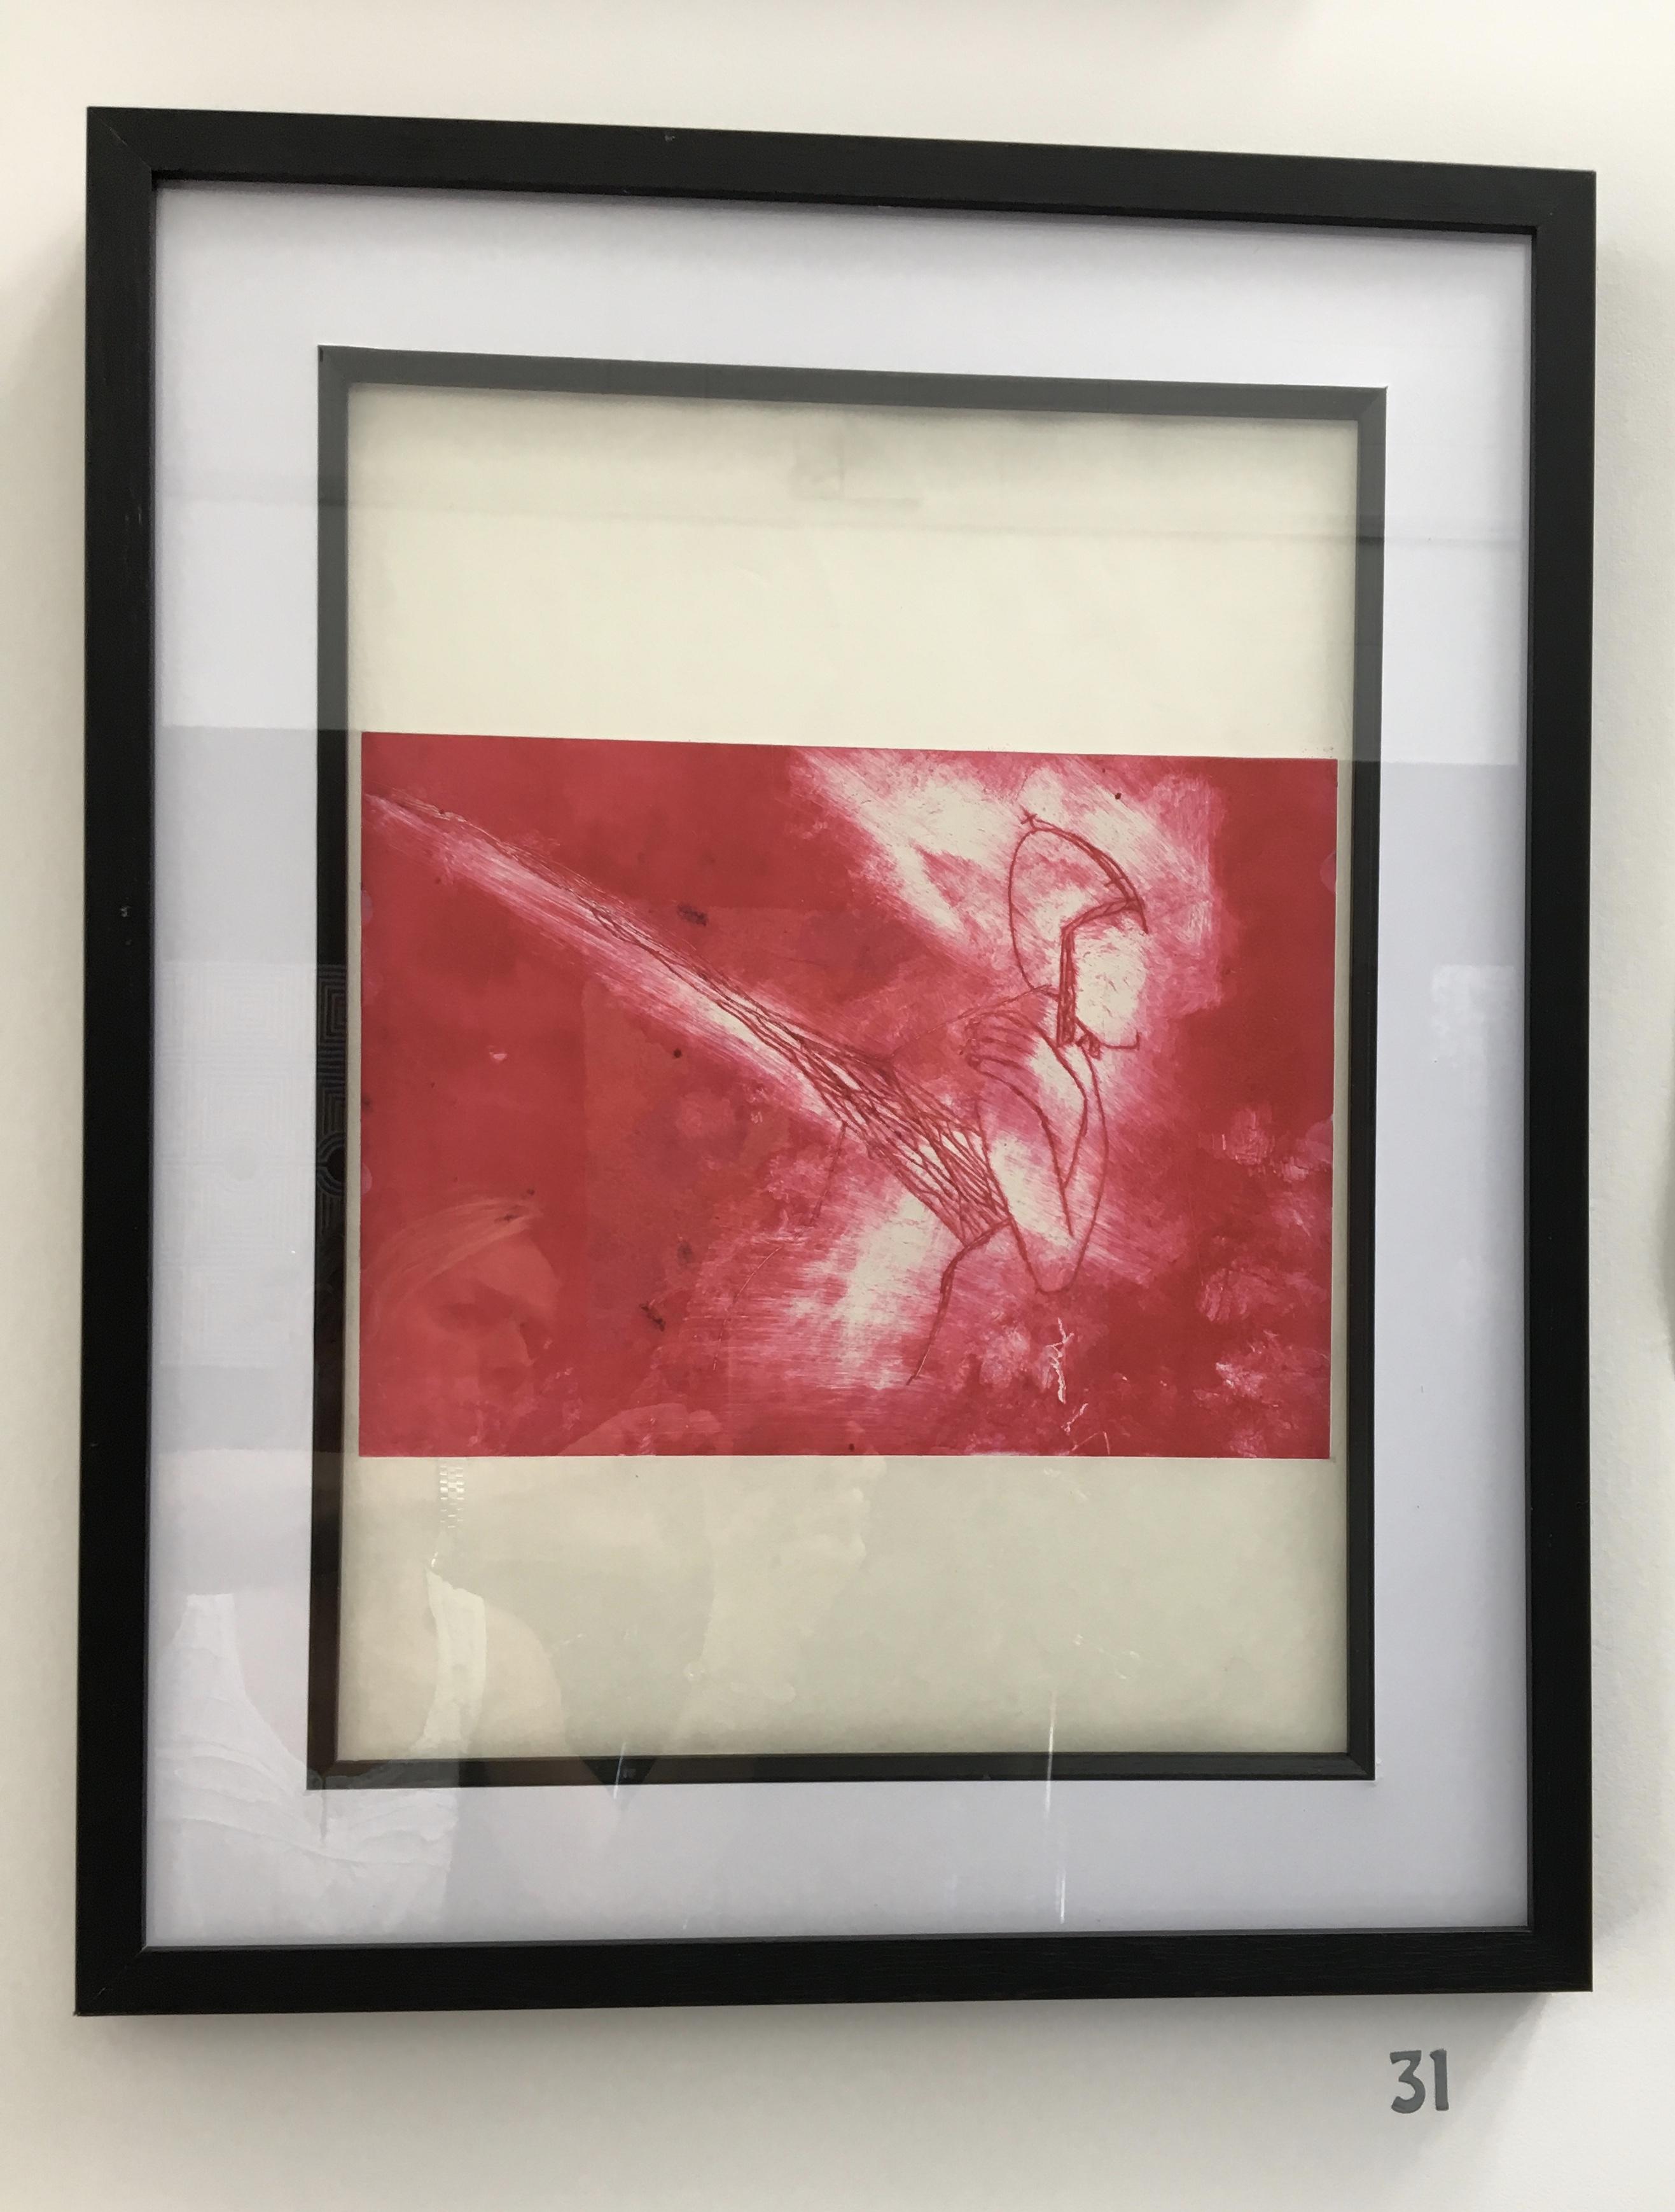 31. Untitled, Julie Dodds, 43 x 53 x 3, £ offers